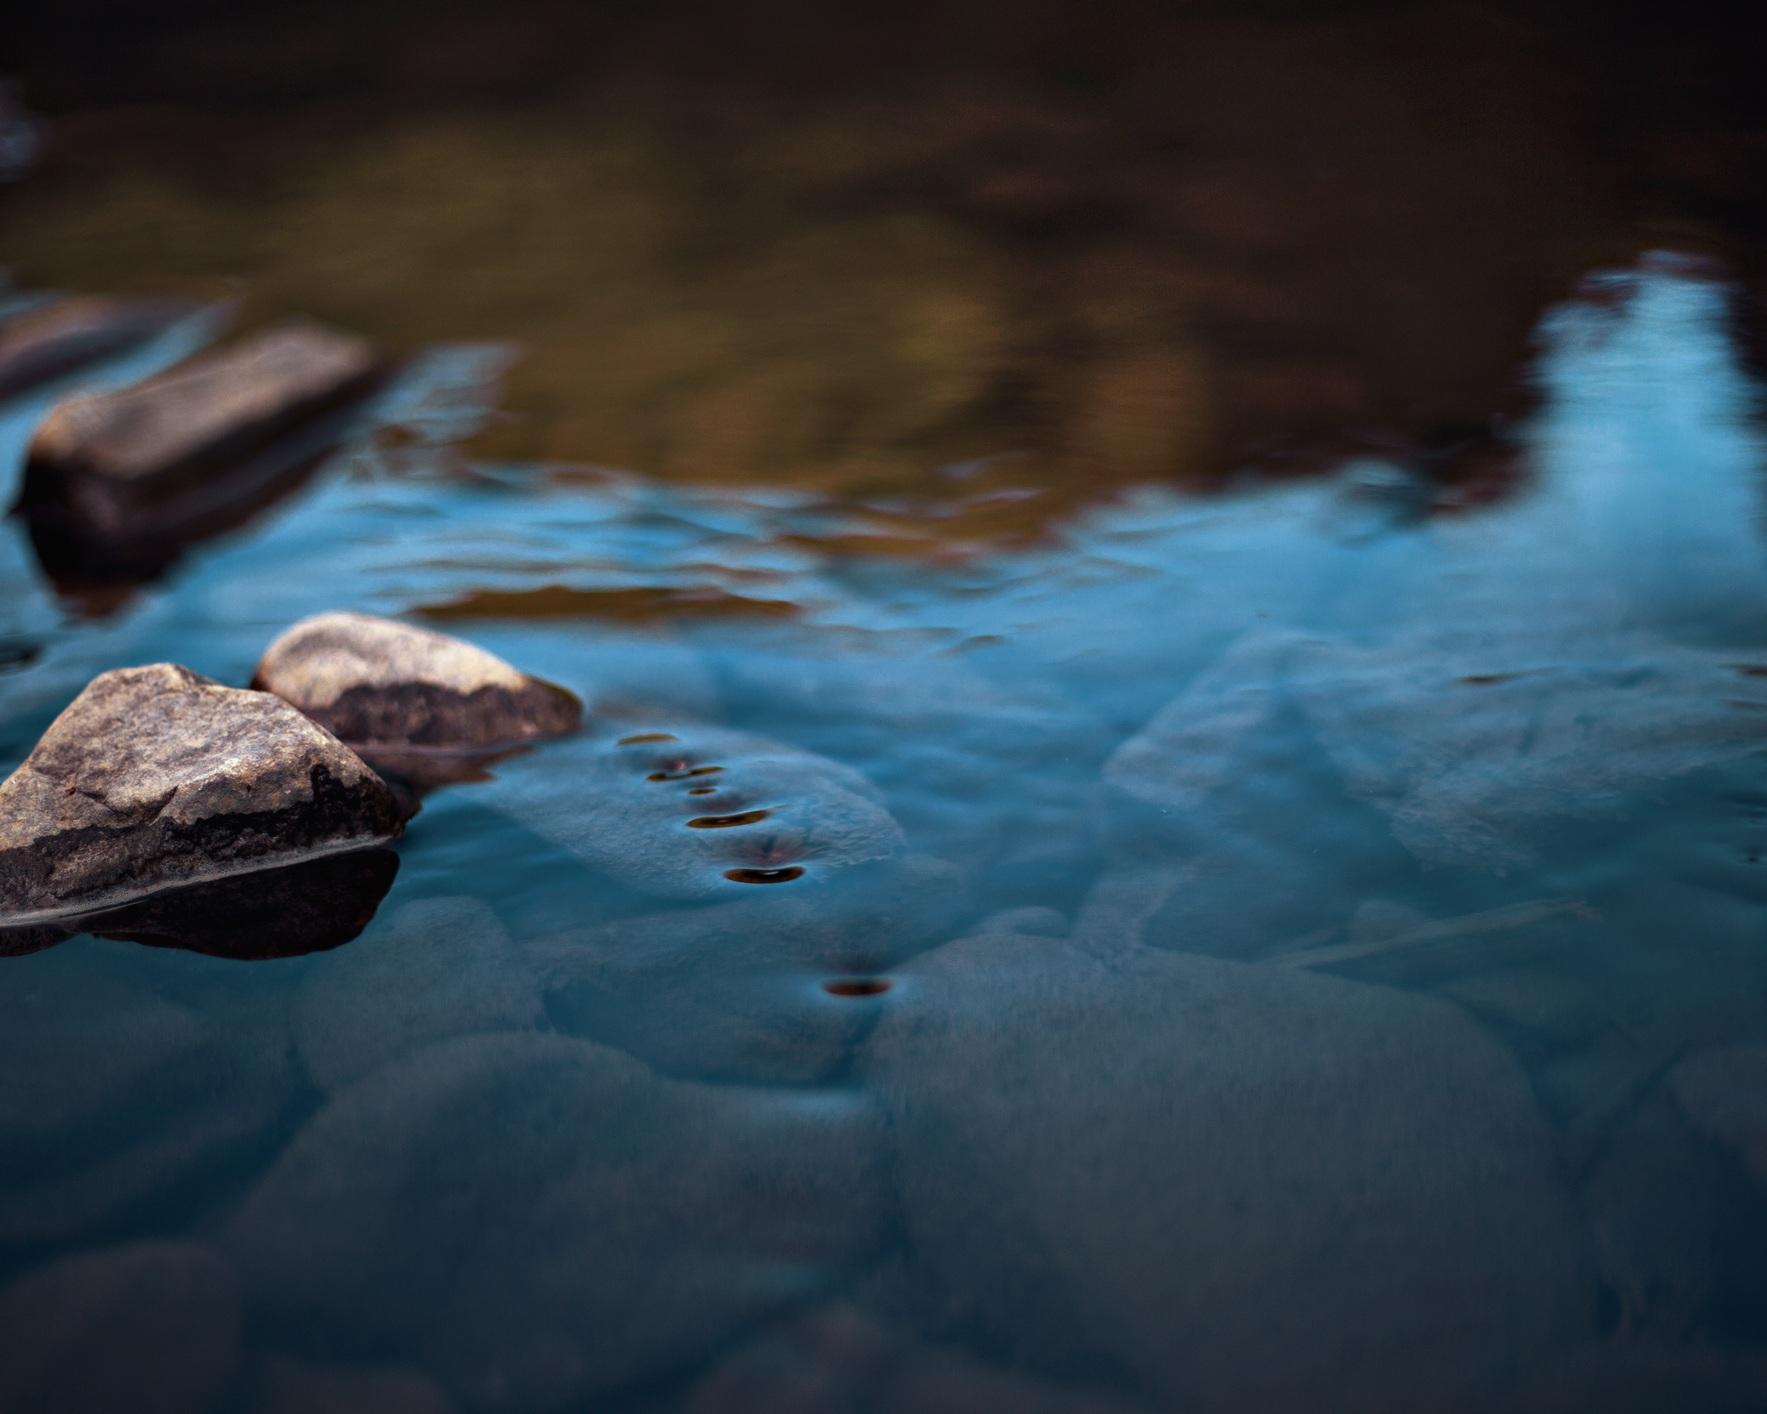 Pinchot Institute for Conservation - Delaware, 2015Improving Freshwater Resiliency in the Upper Delaware River Basin